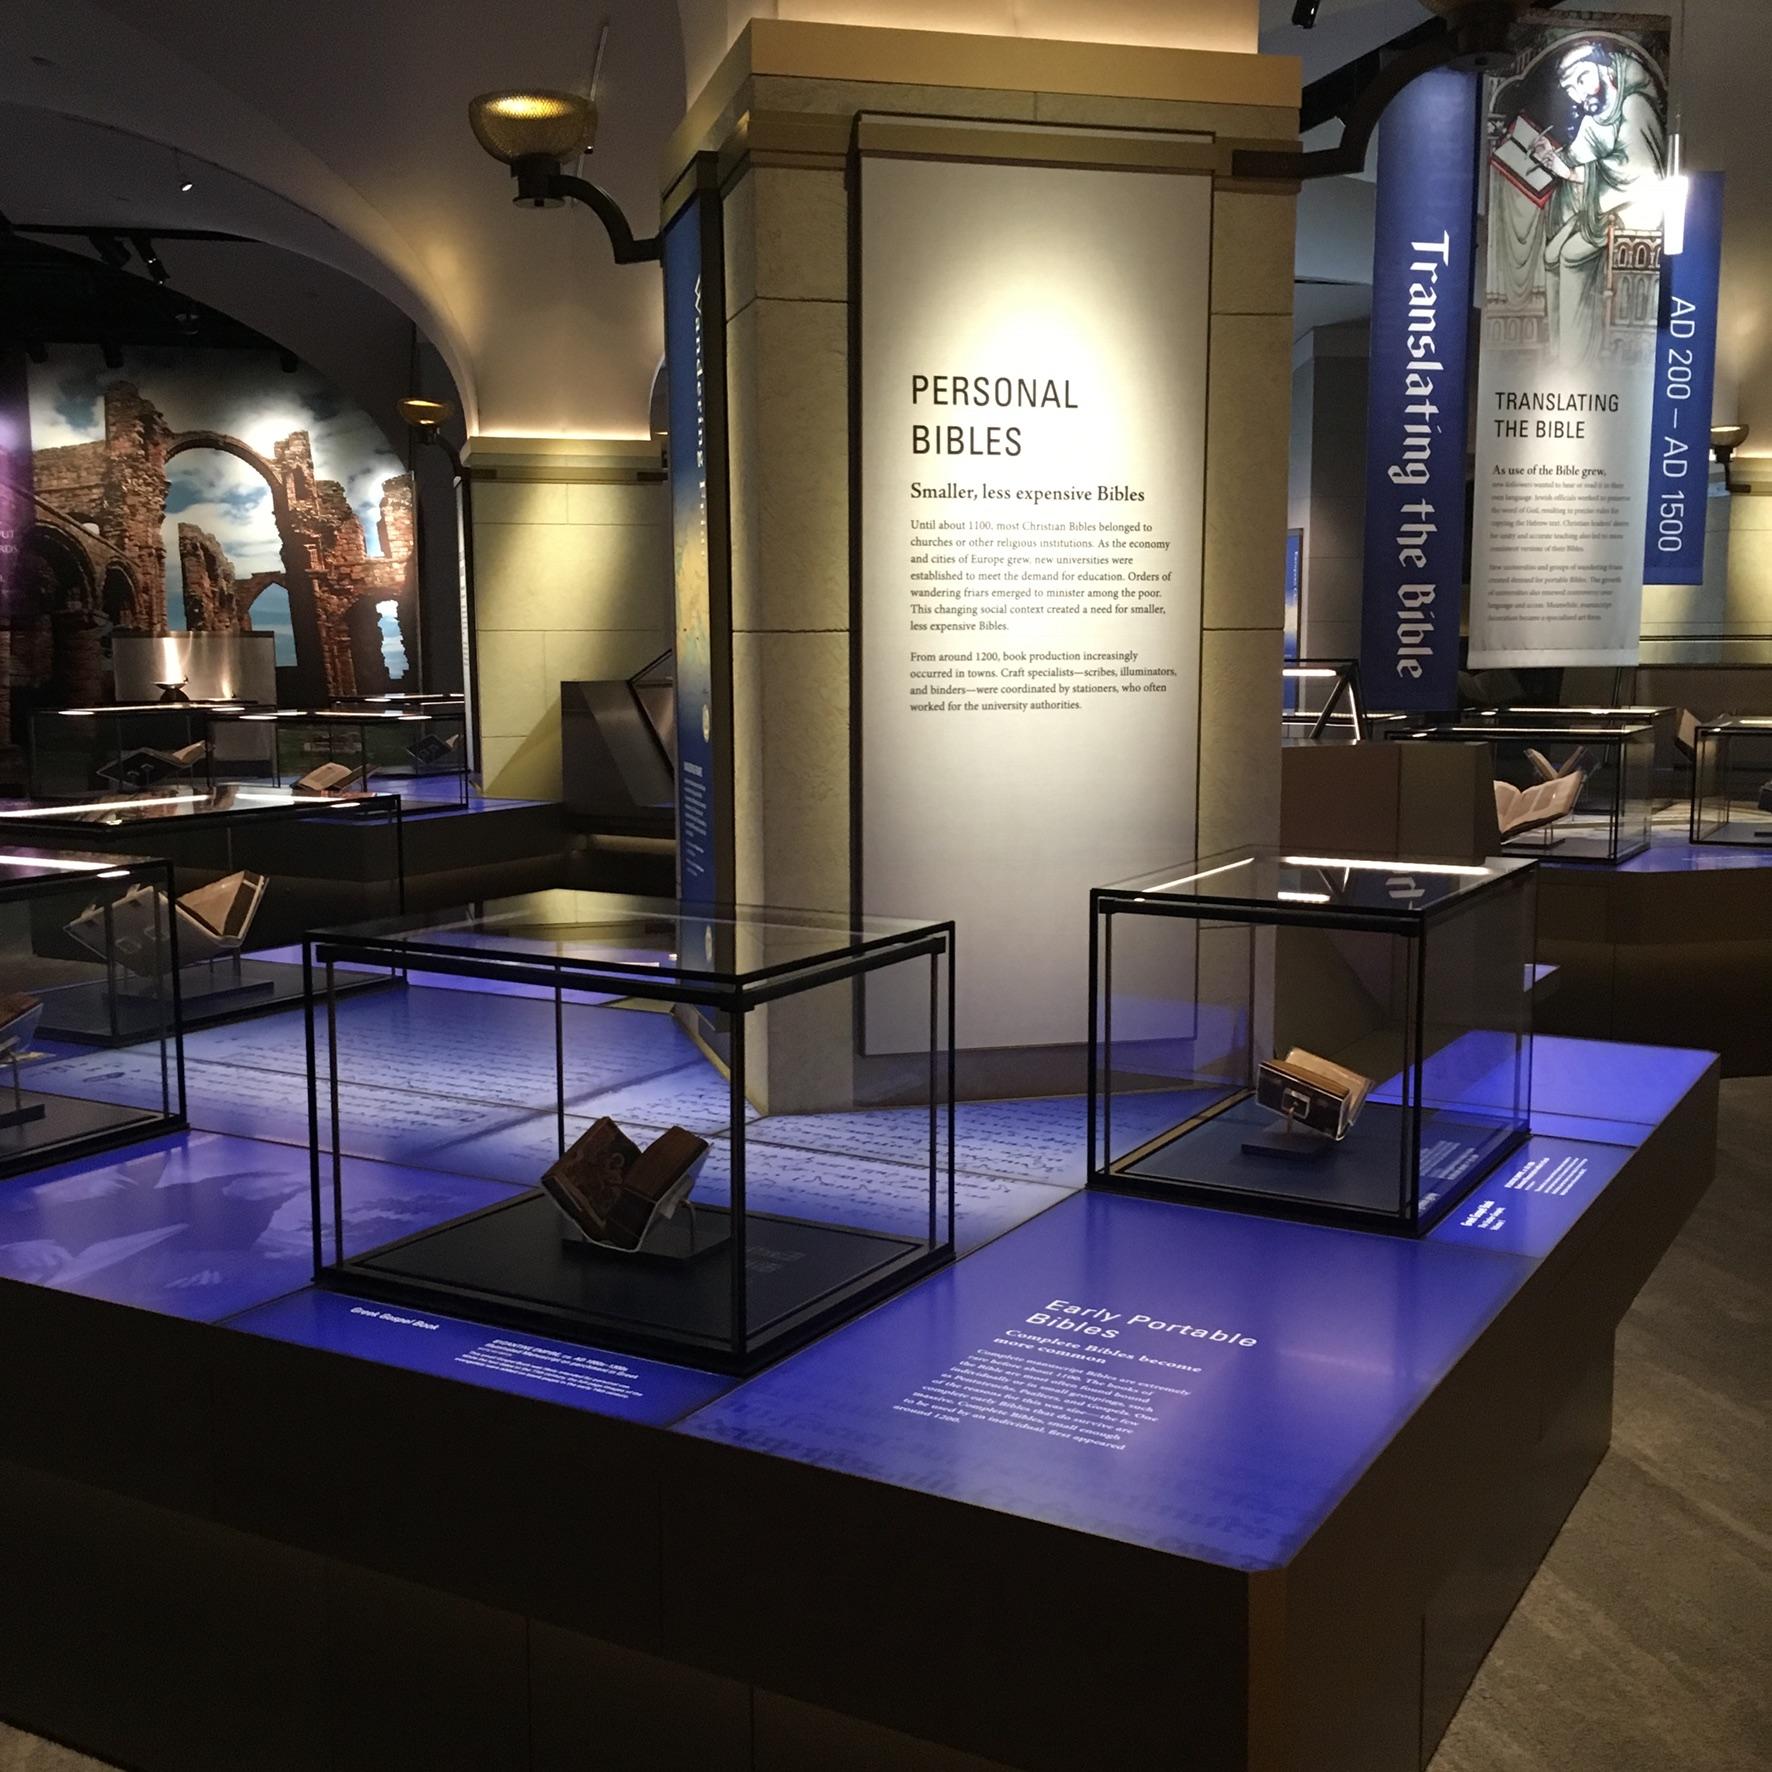 File:Museum of the Bible Washington DC 04.jpg - Wikimedia Commons